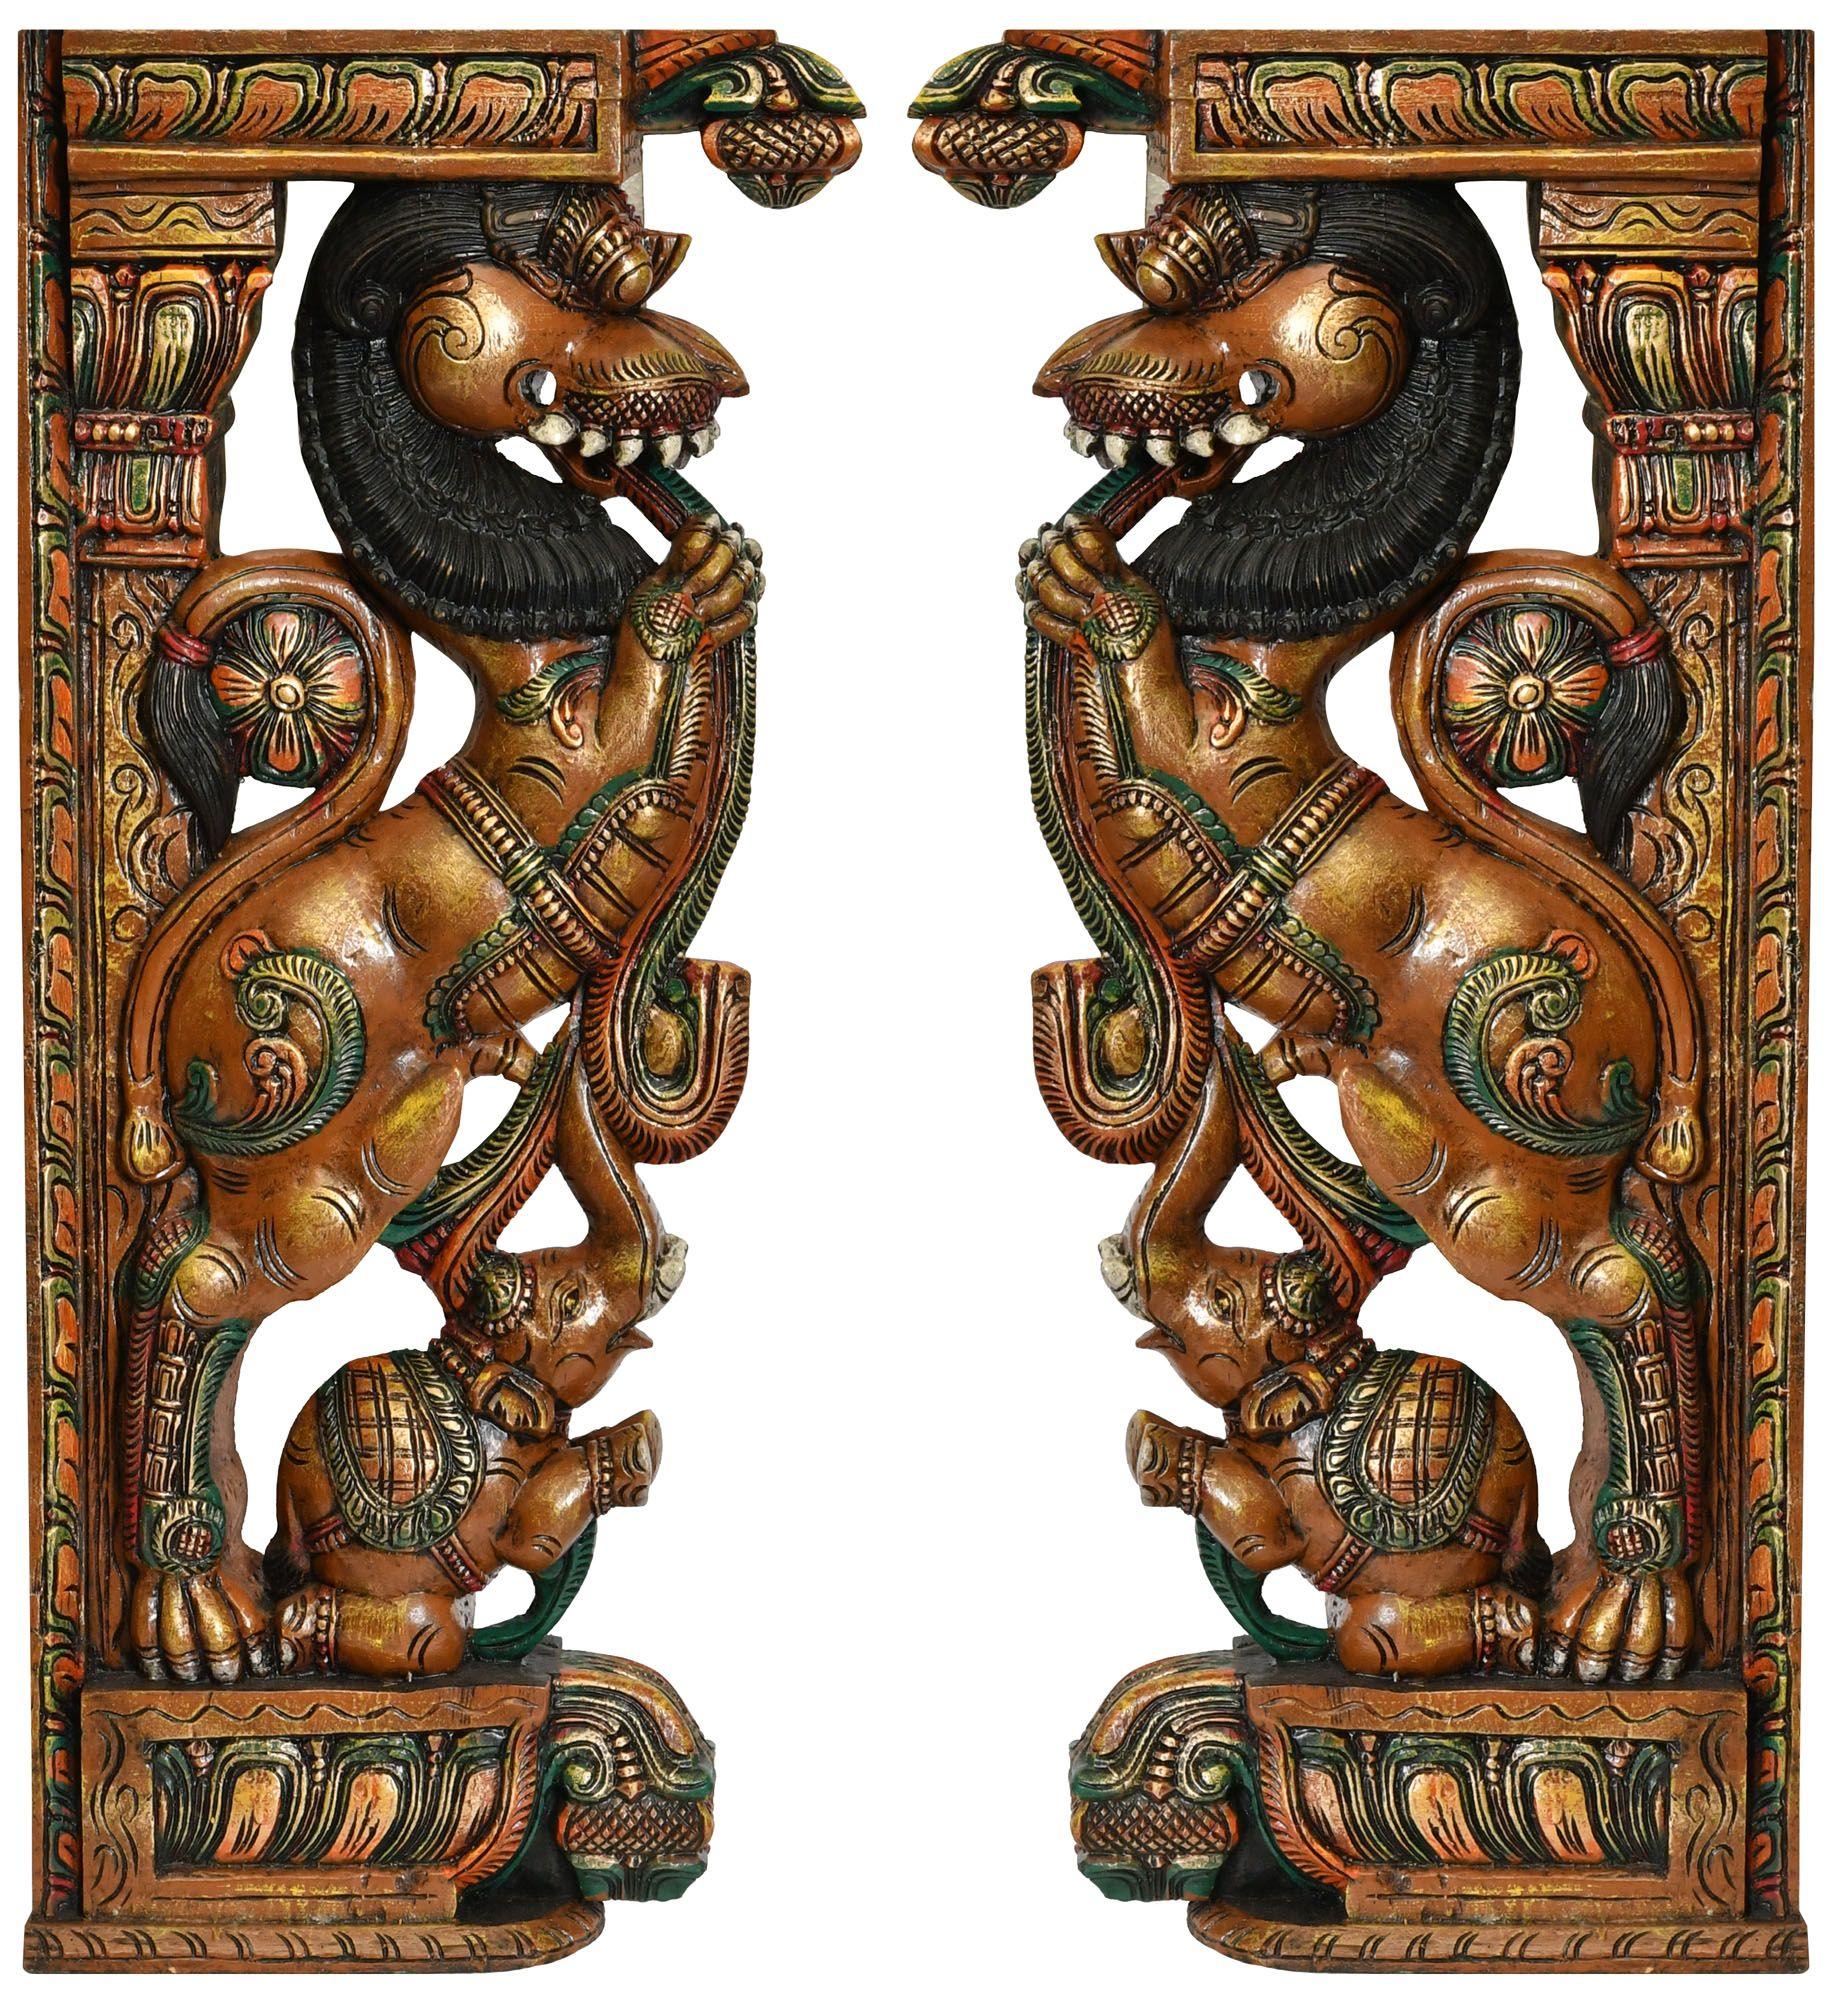 Pair of Yali Wooden Corbel Bracket painted Hindu Temple Sculpture Statue Handmad